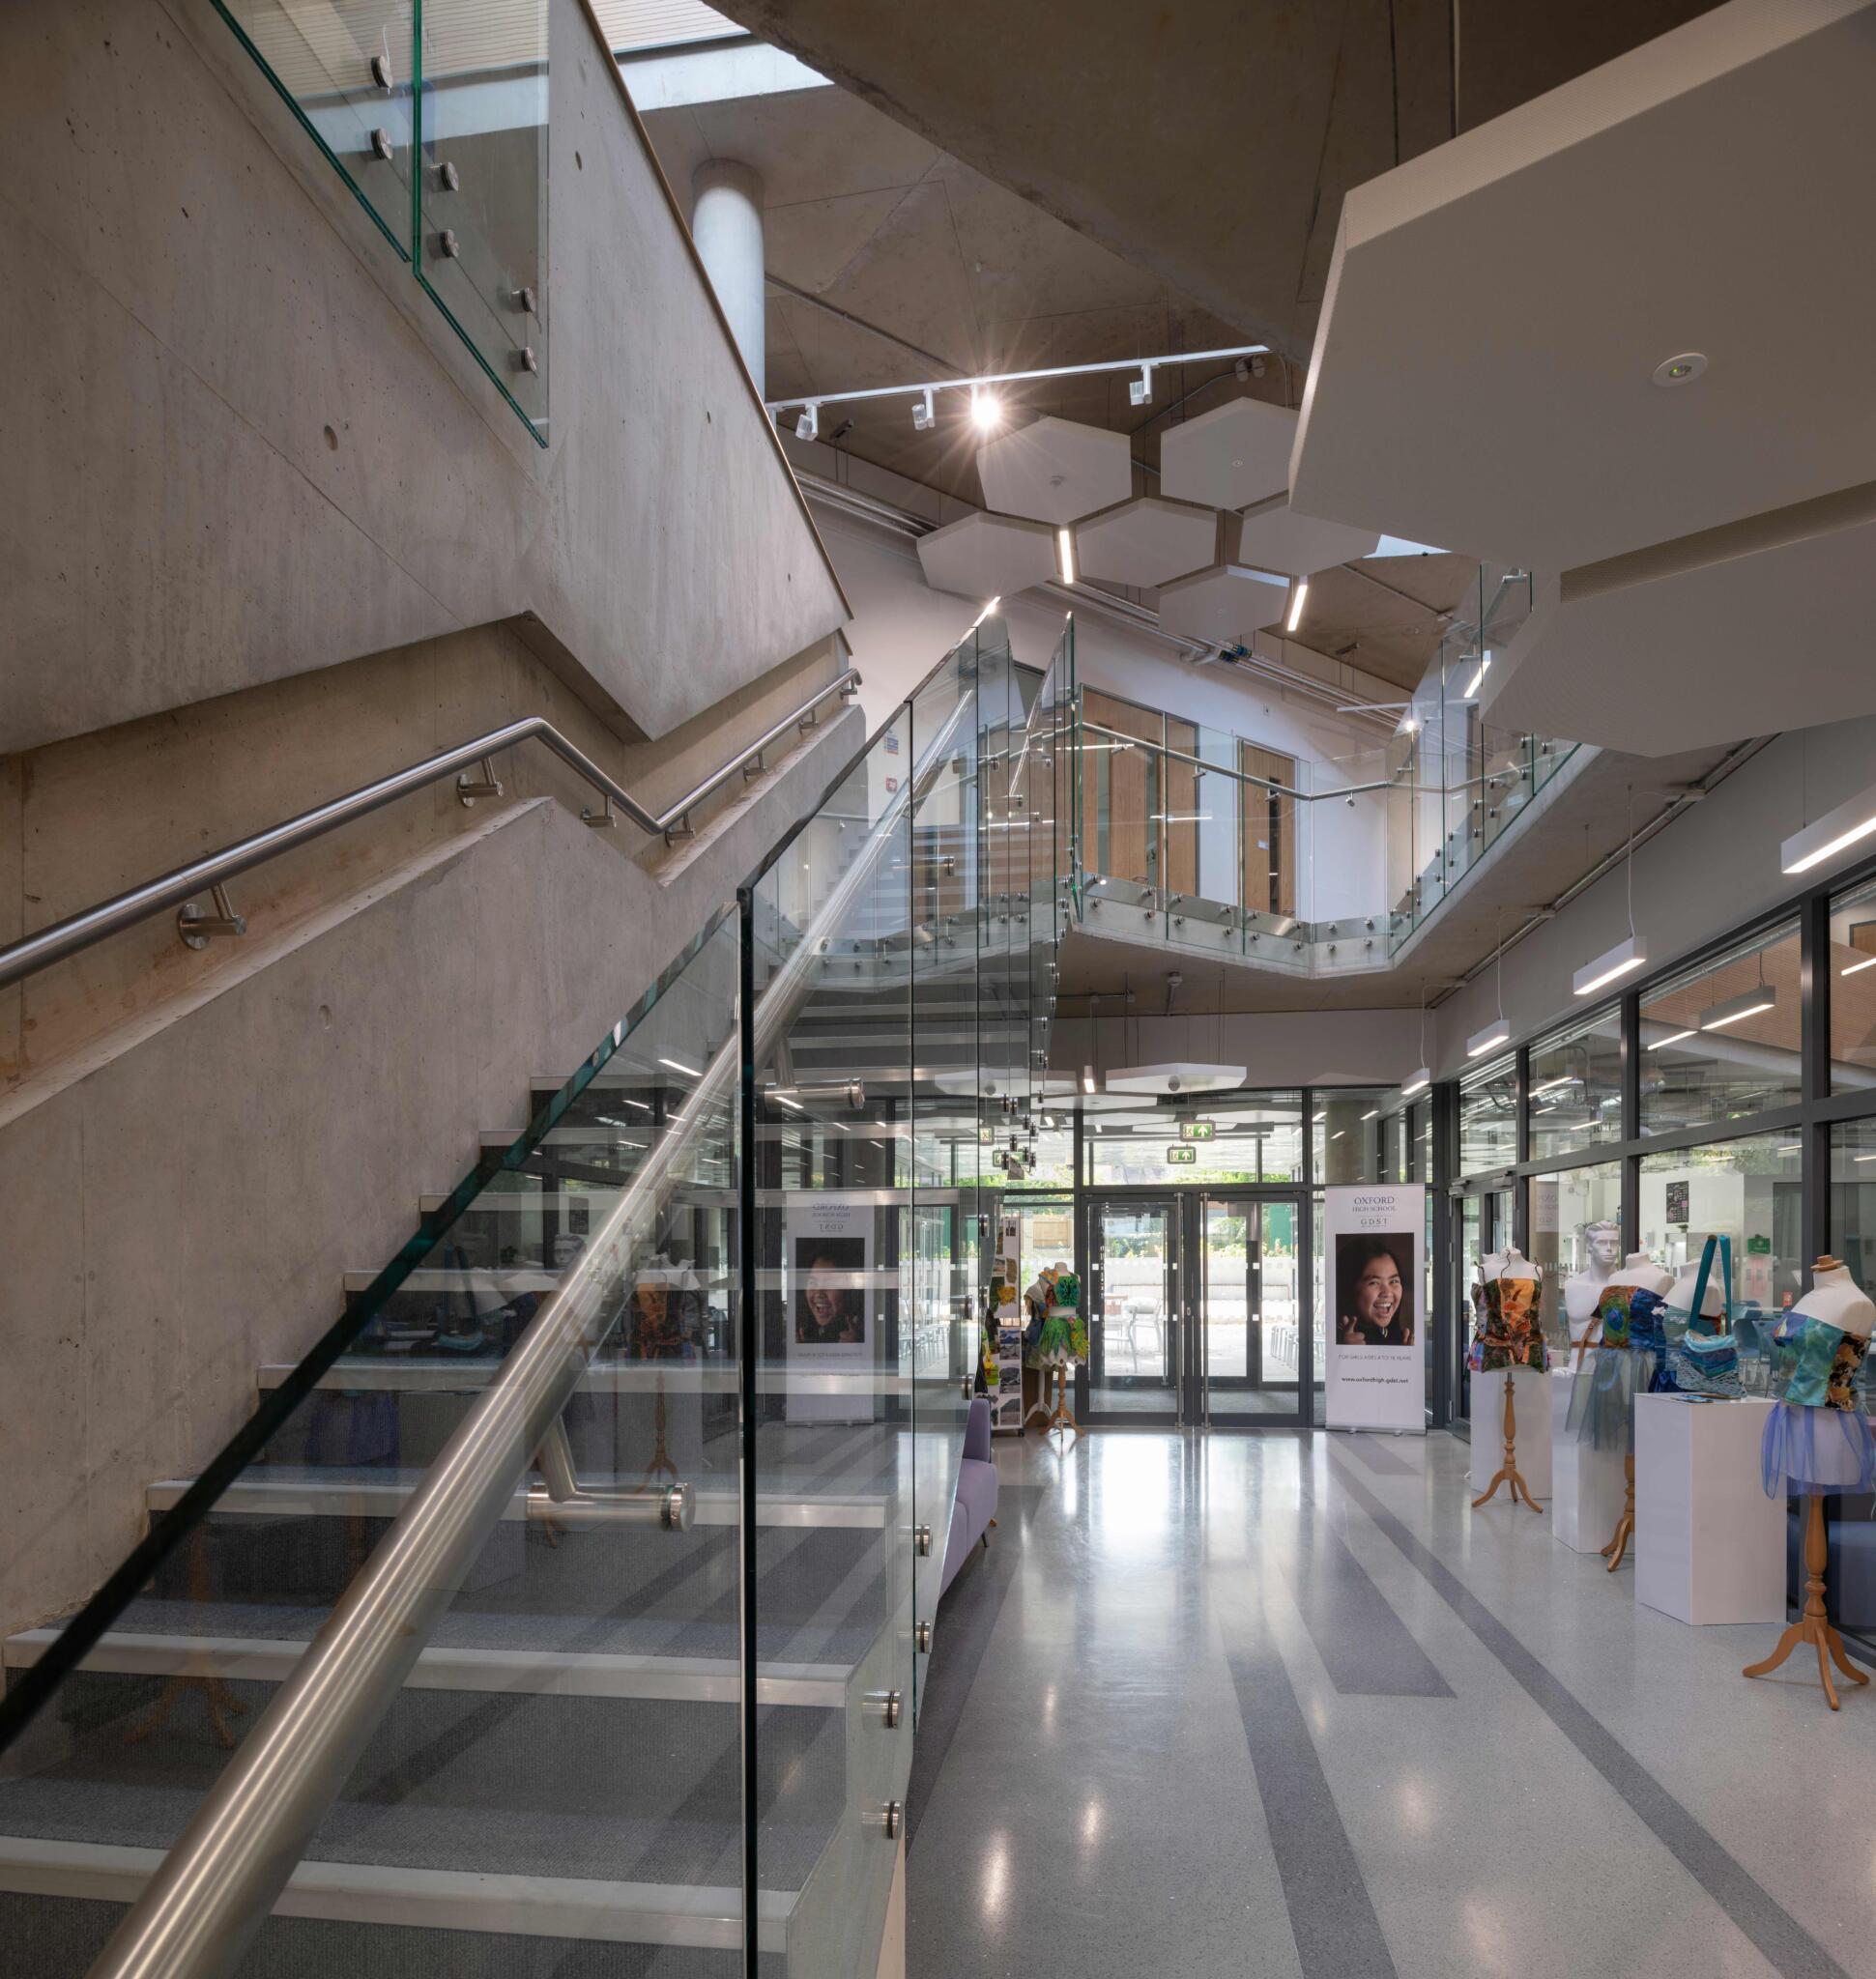 Ada Benson Building - Oxford High School